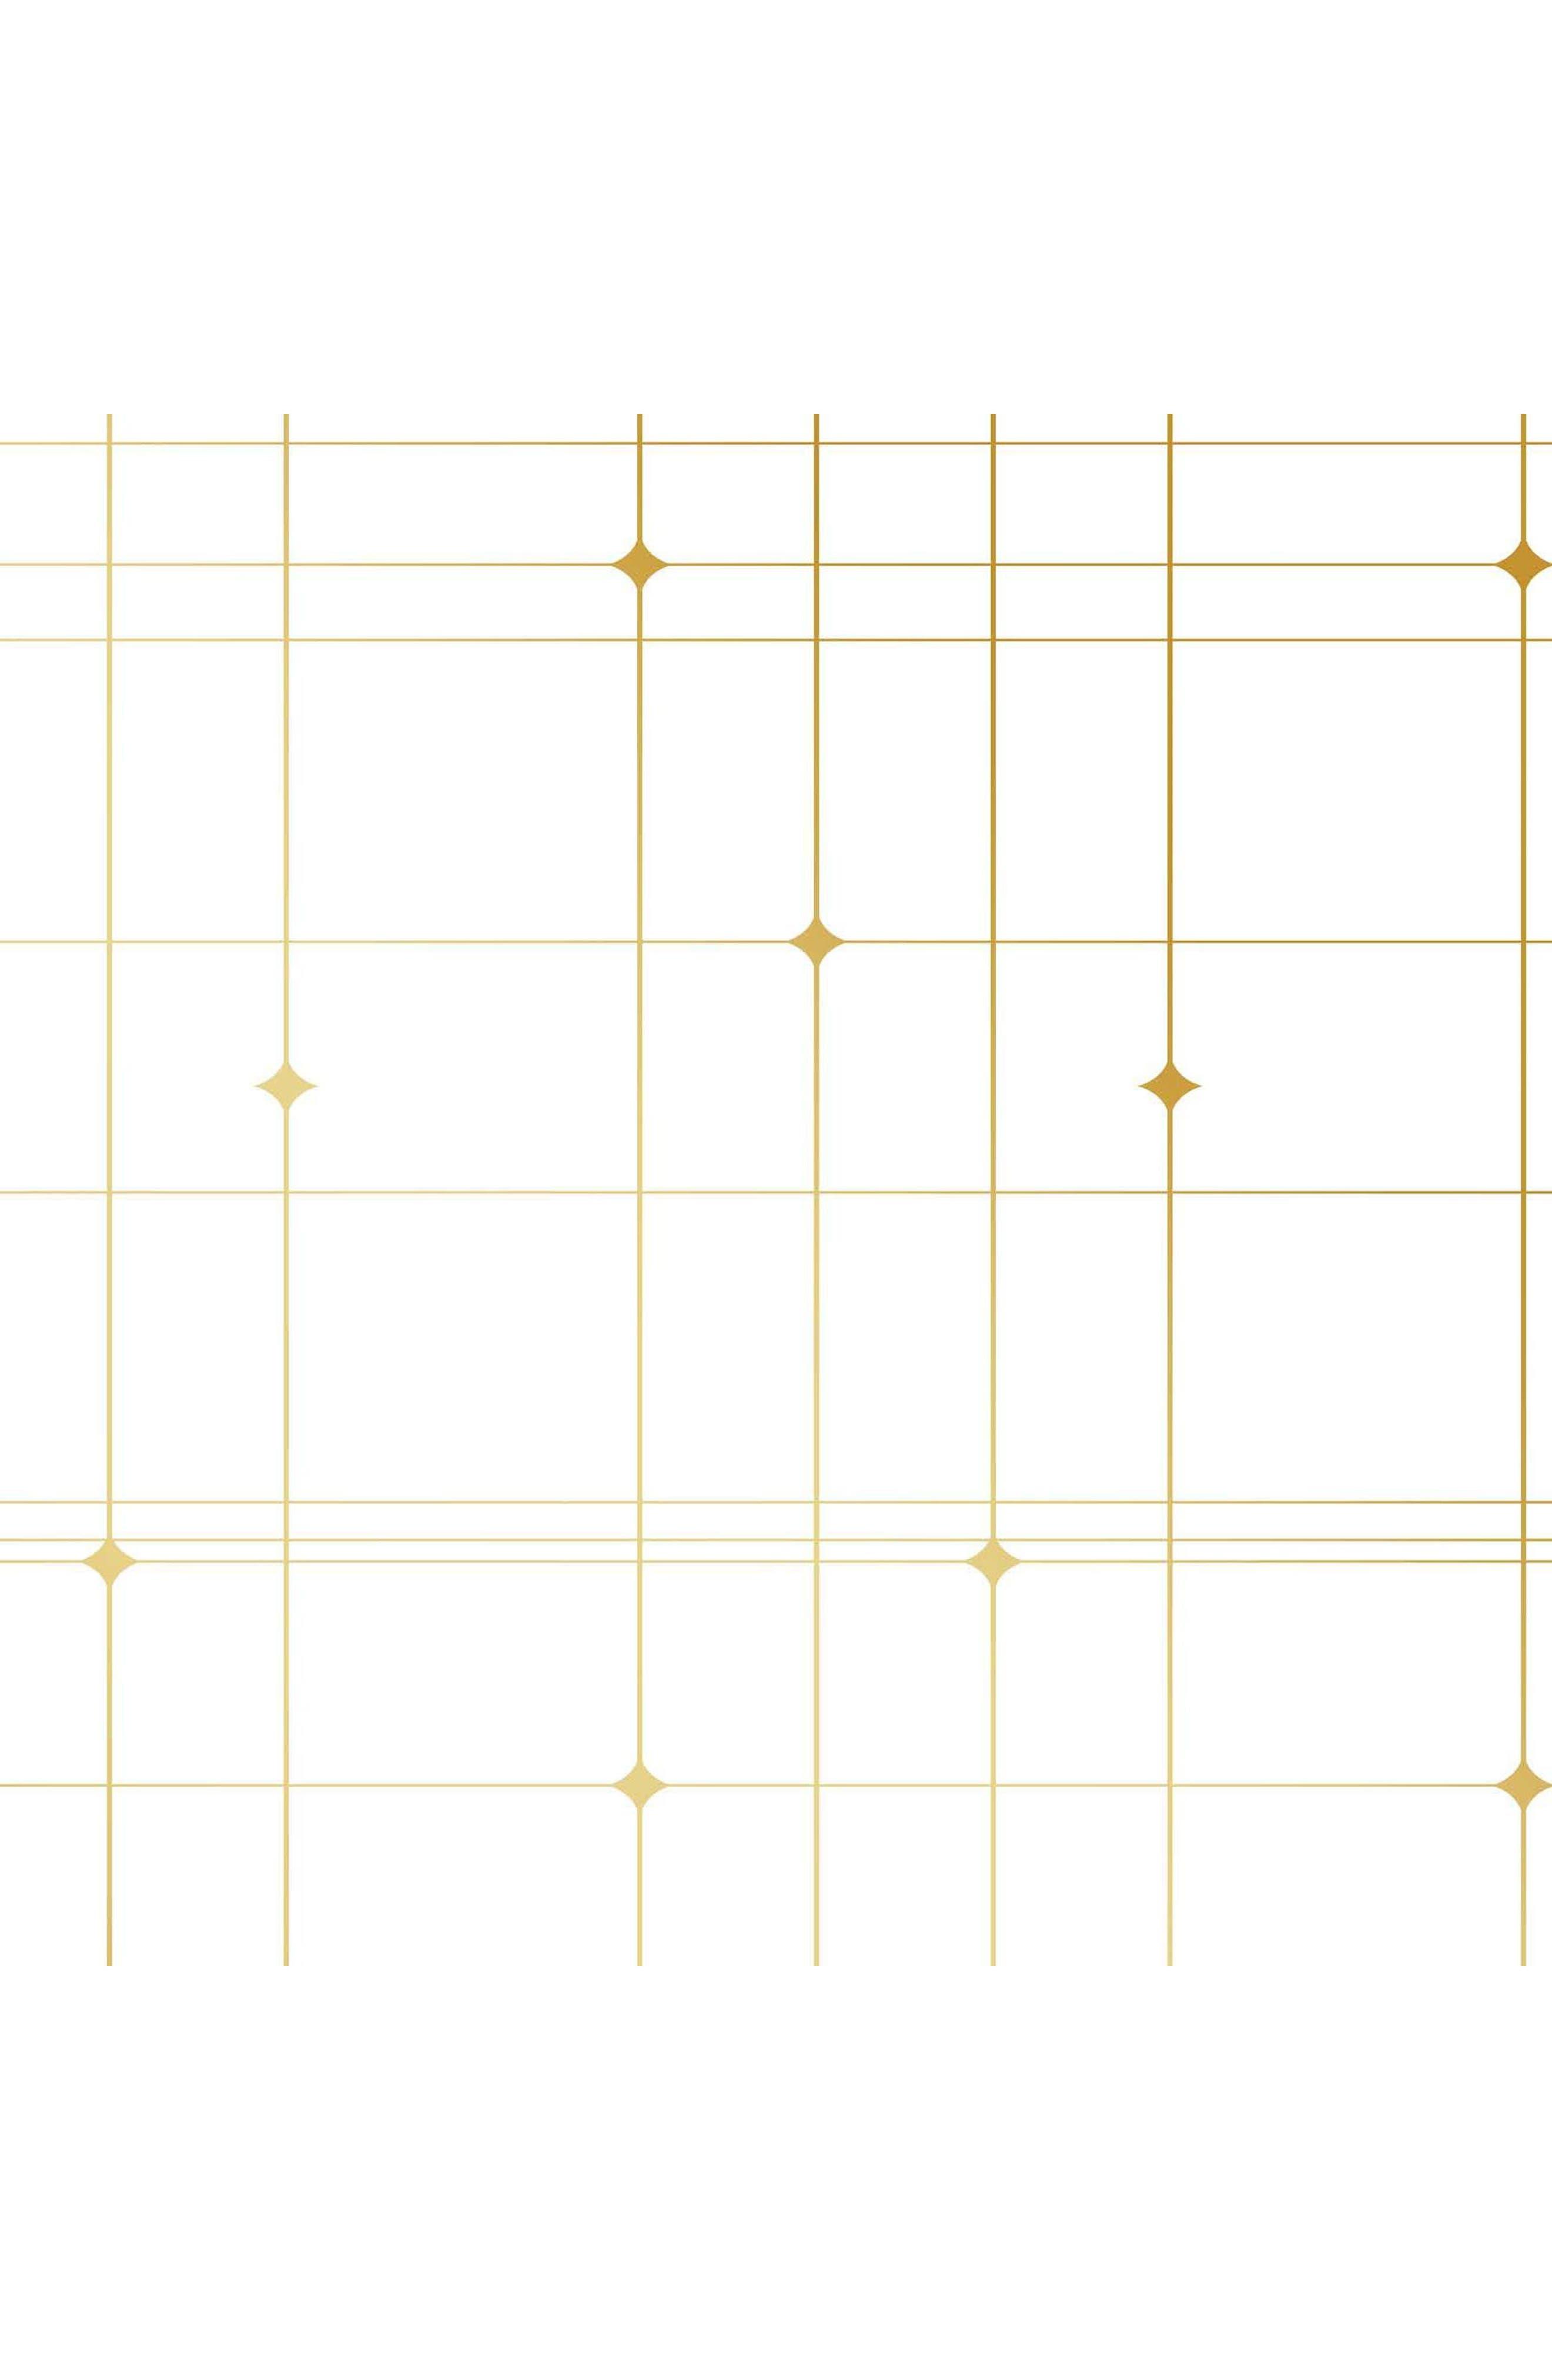 Thermoscad Self-Adhesive Vinyl Wallpaper,                         Main,                         color, Metallic Gold/ White